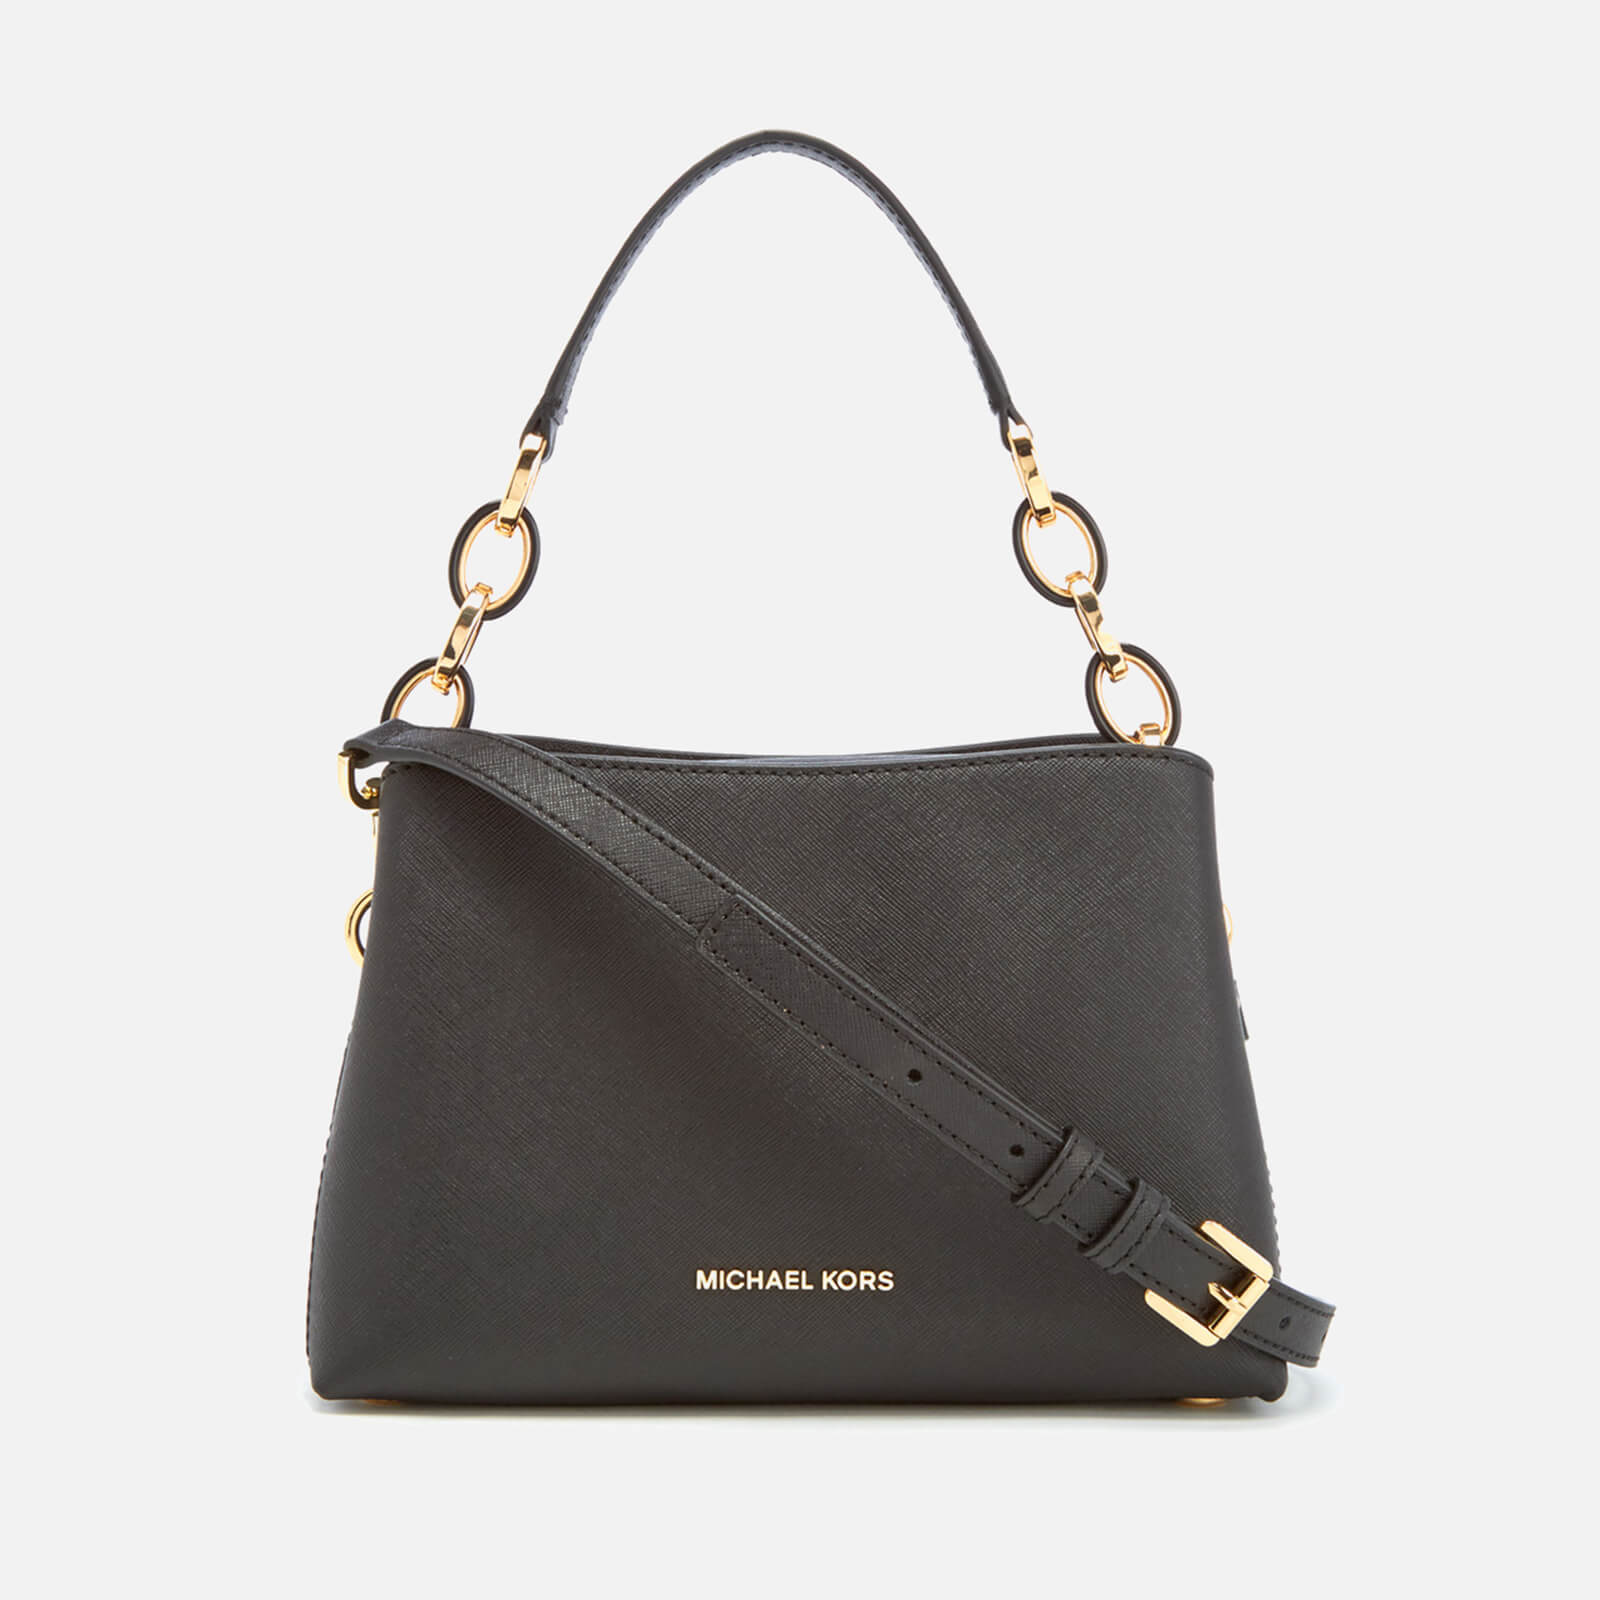 7ed9e28a760e87 MICHAEL MICHAEL KORS Women's Portia Small Shoulder Bag - Black - Free UK  Delivery over £50